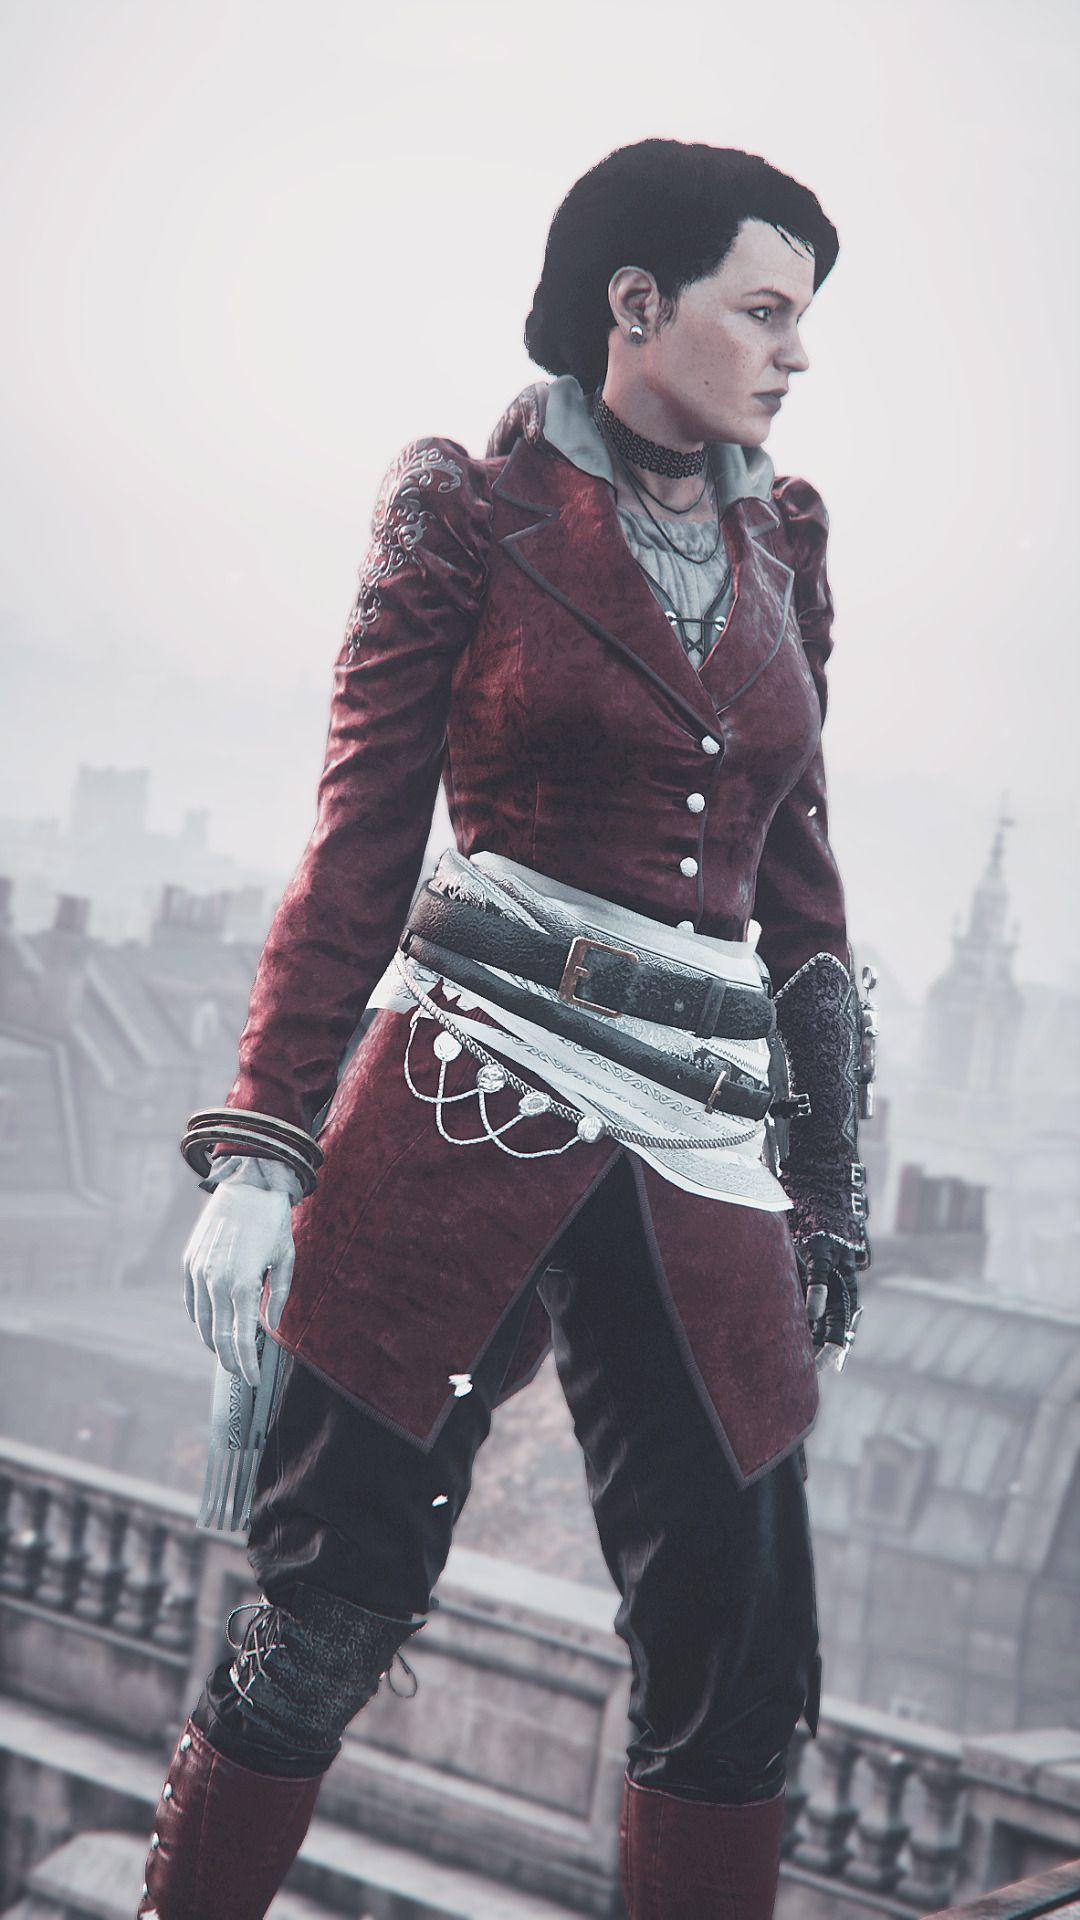 Jack The Ripper Dlc Assassins Creed Evie Assasins Creed Costume Assassins Creed Syndicate Evie